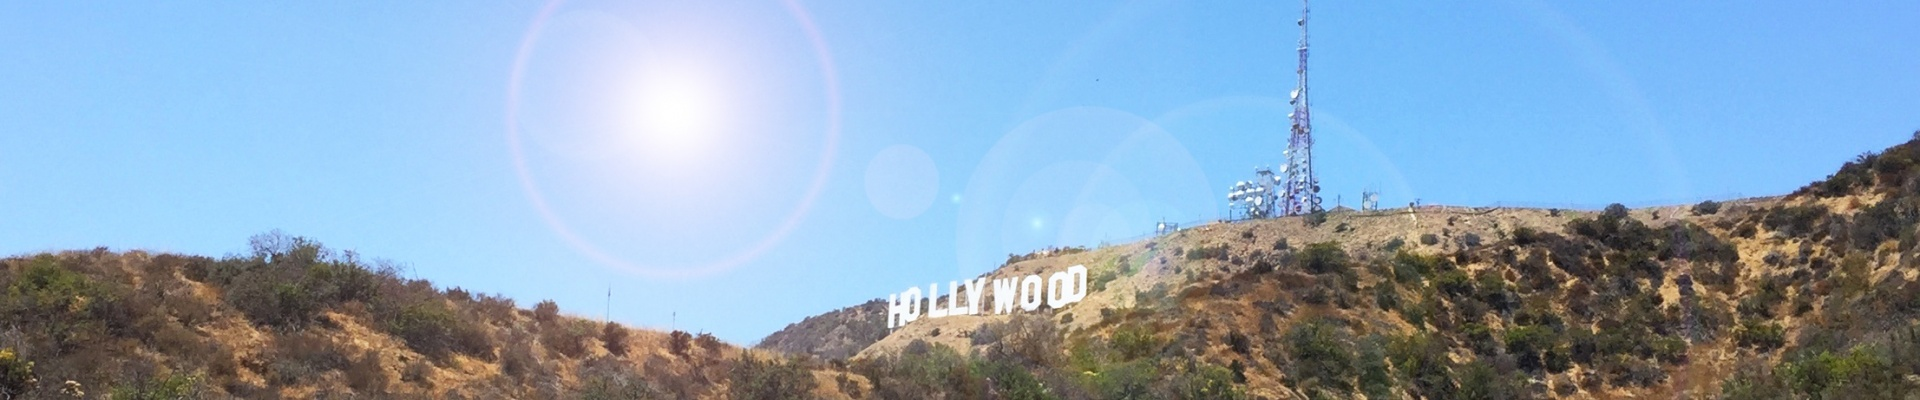 Discover...<br/>Los Angeles